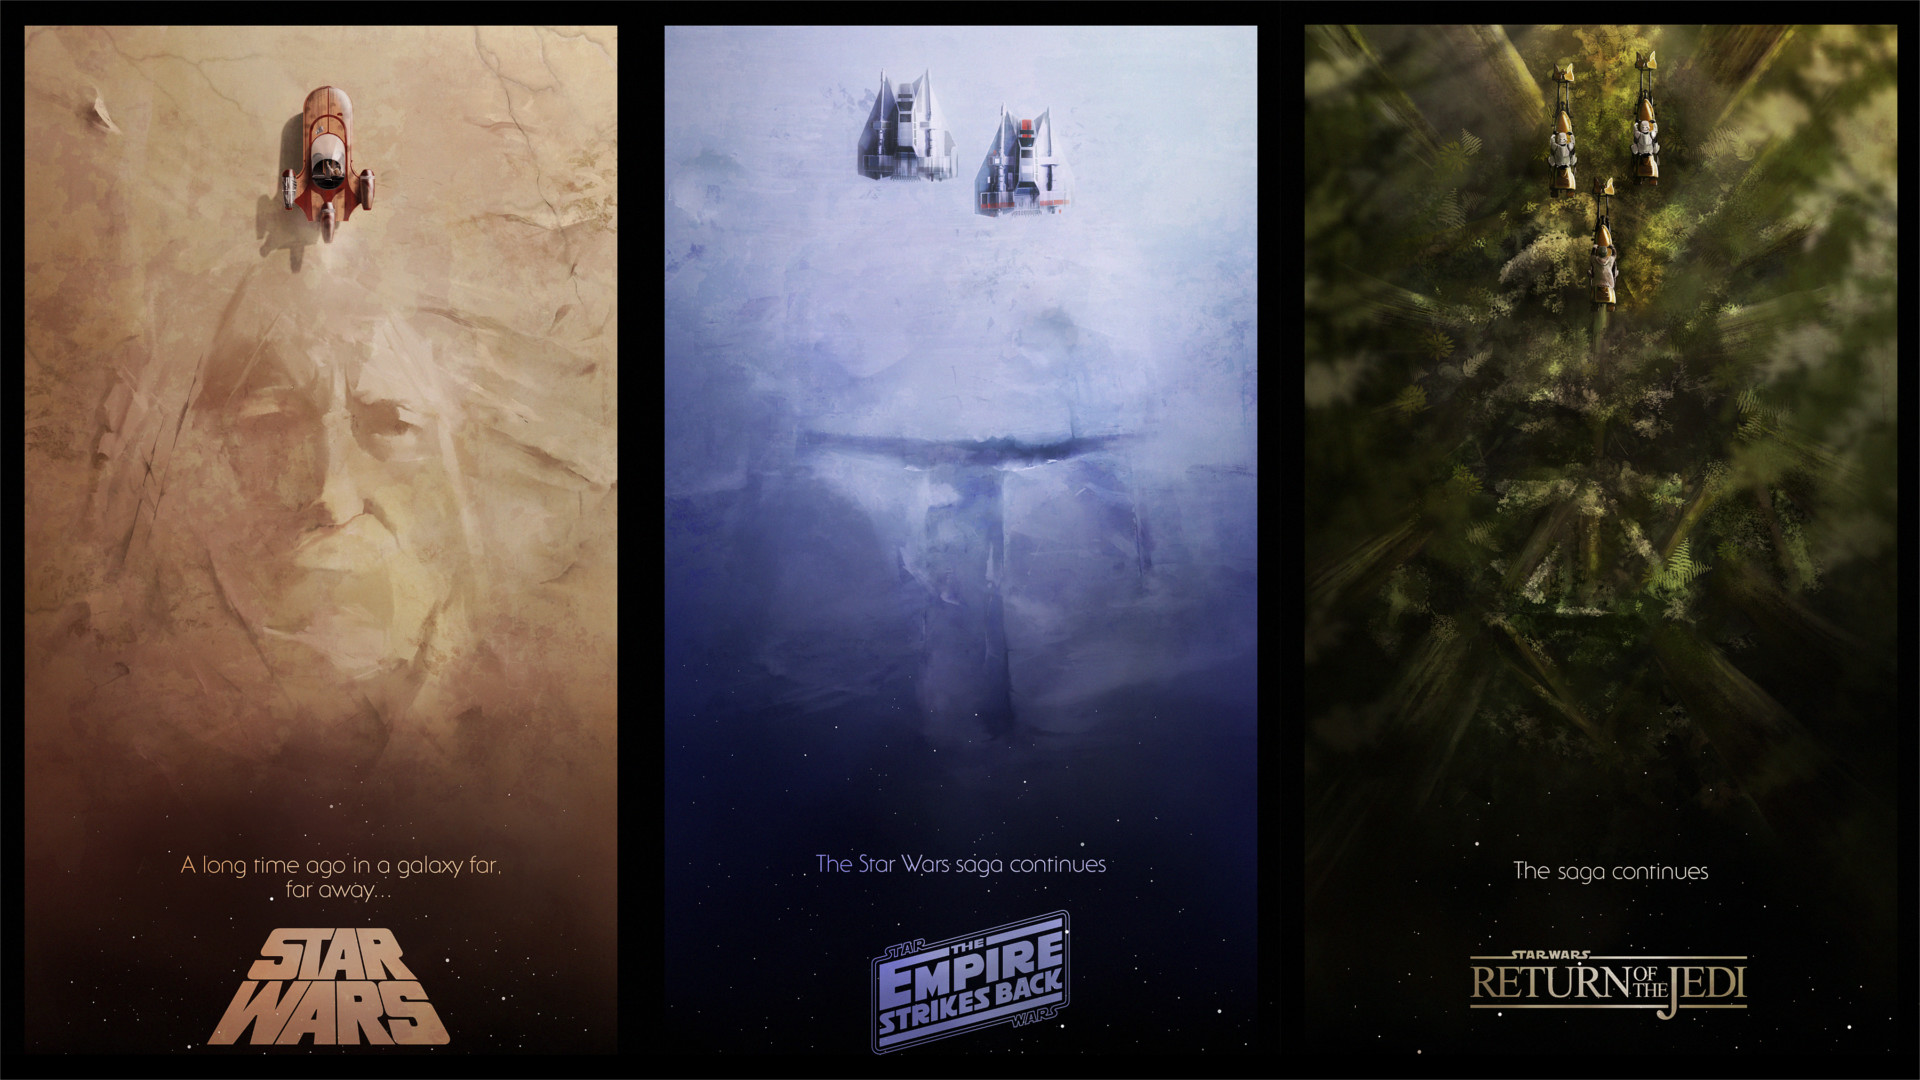 Photo: Full HD Star Wars Poster Wallpapers, by Darius Toews